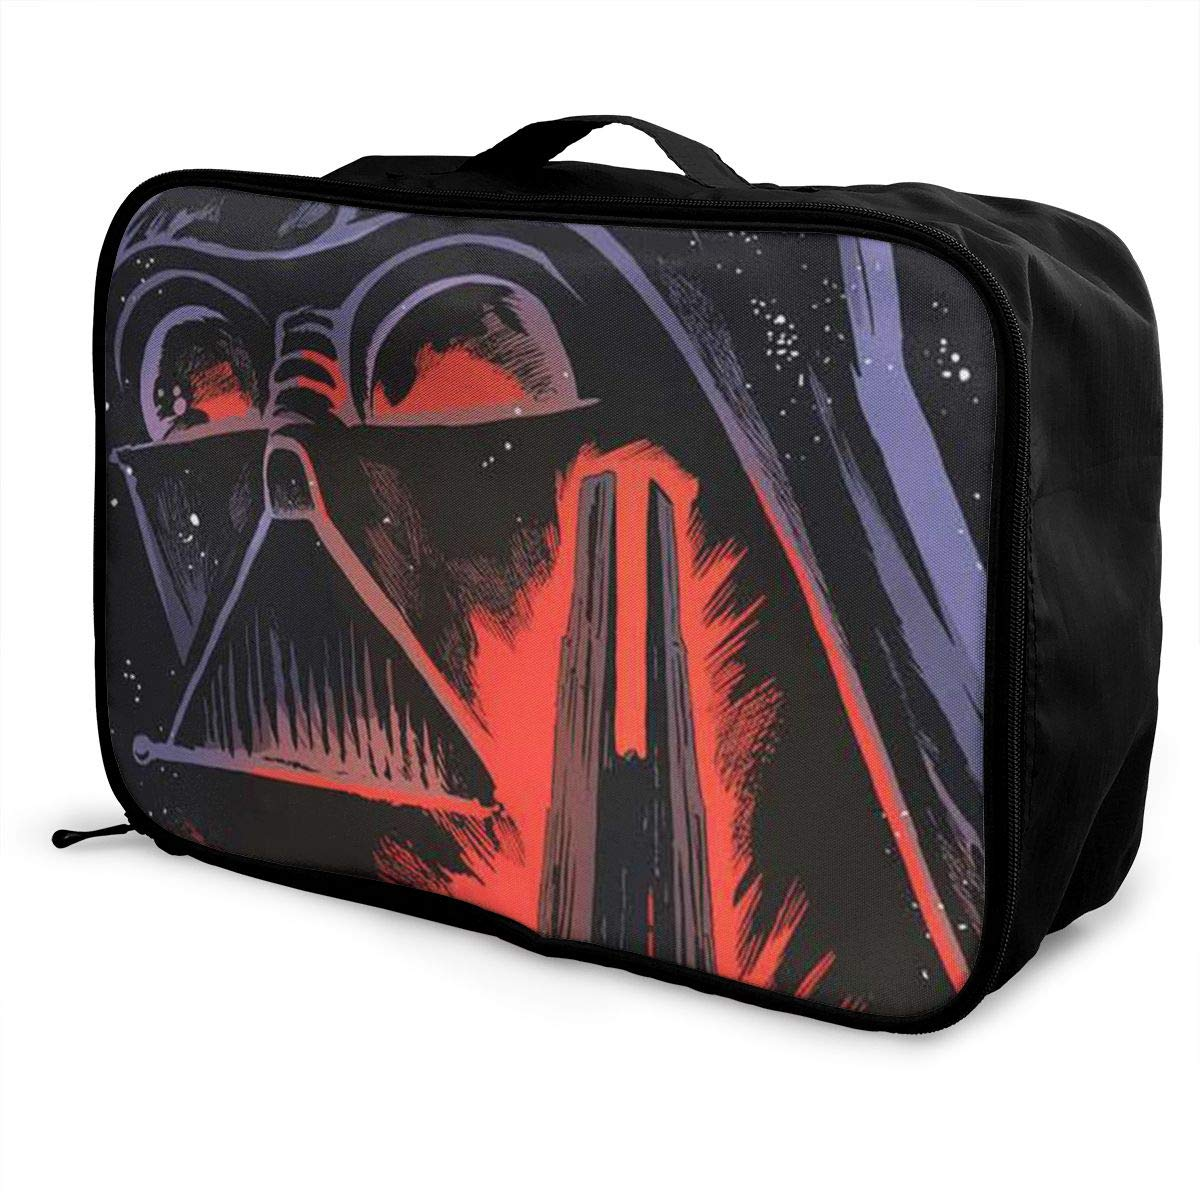 BOKAIKAI1306 Fierce D-Darth Vader Unisex Adult Fashion Lightweight Large Capacity Portable Large Travel Duffel Bag Mens Womens Luggage Bag 3D Printed DIY Boarding Box